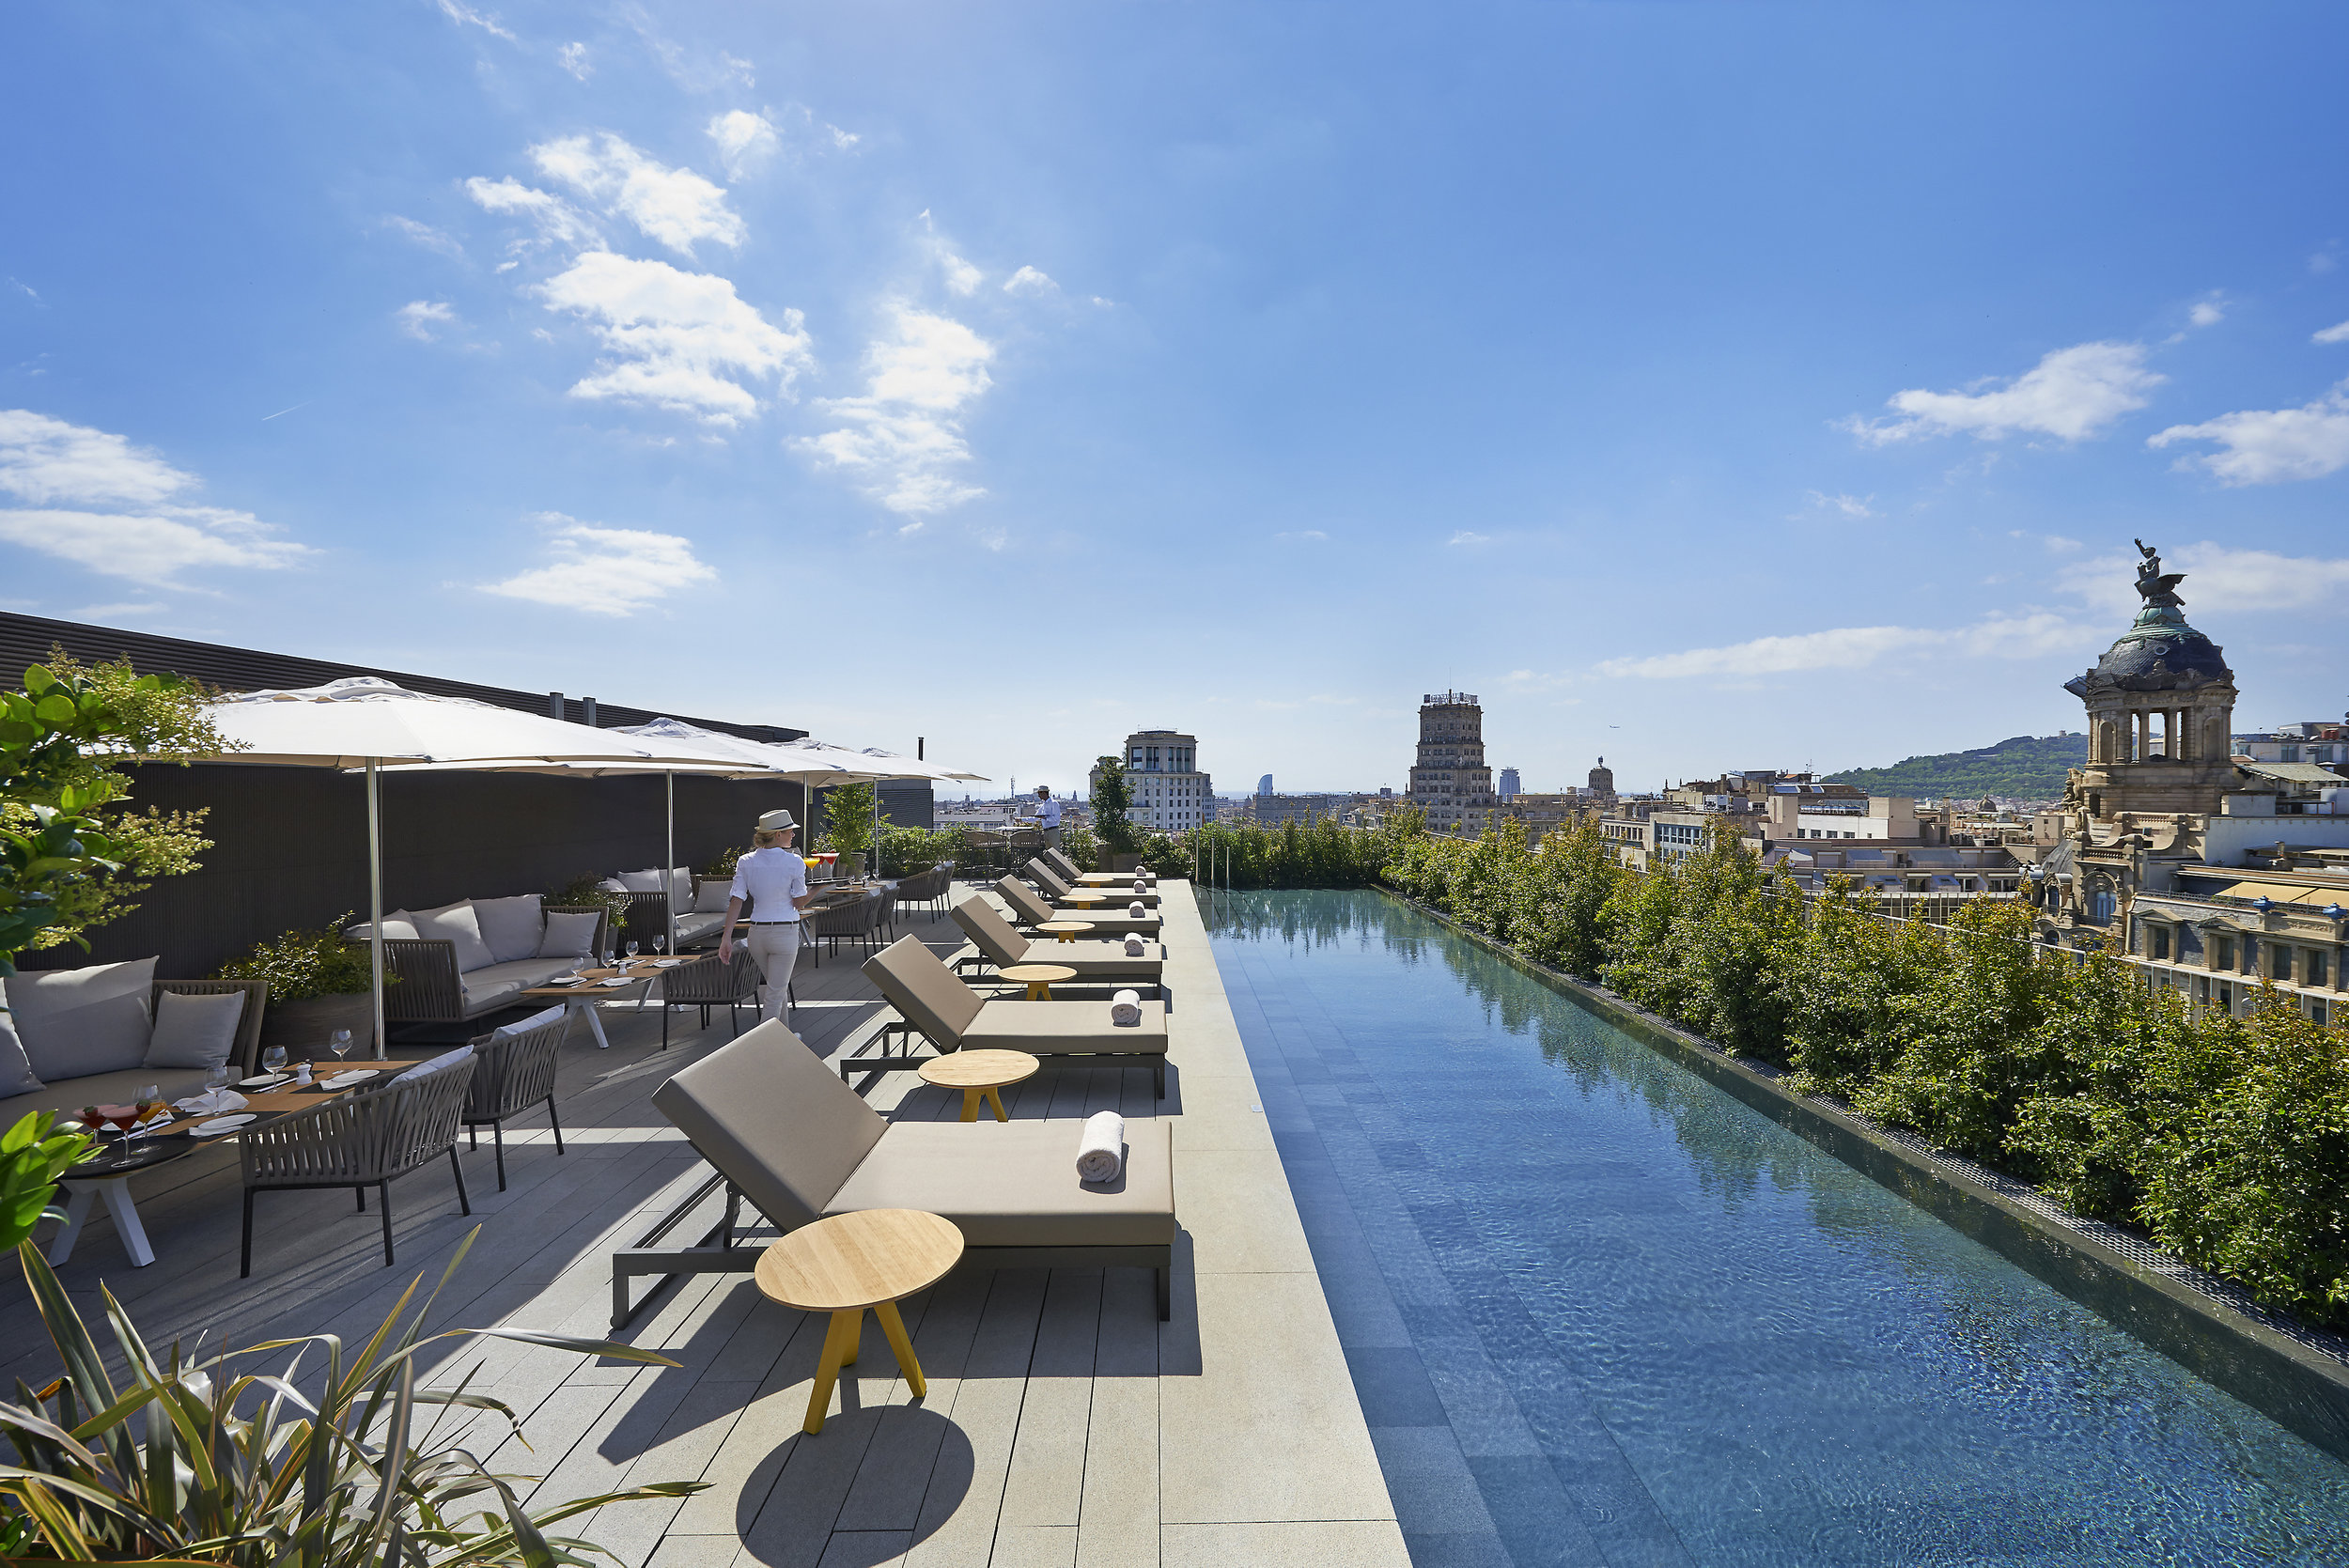 barcelona-2014-fine-dining-terrat-03.jpg